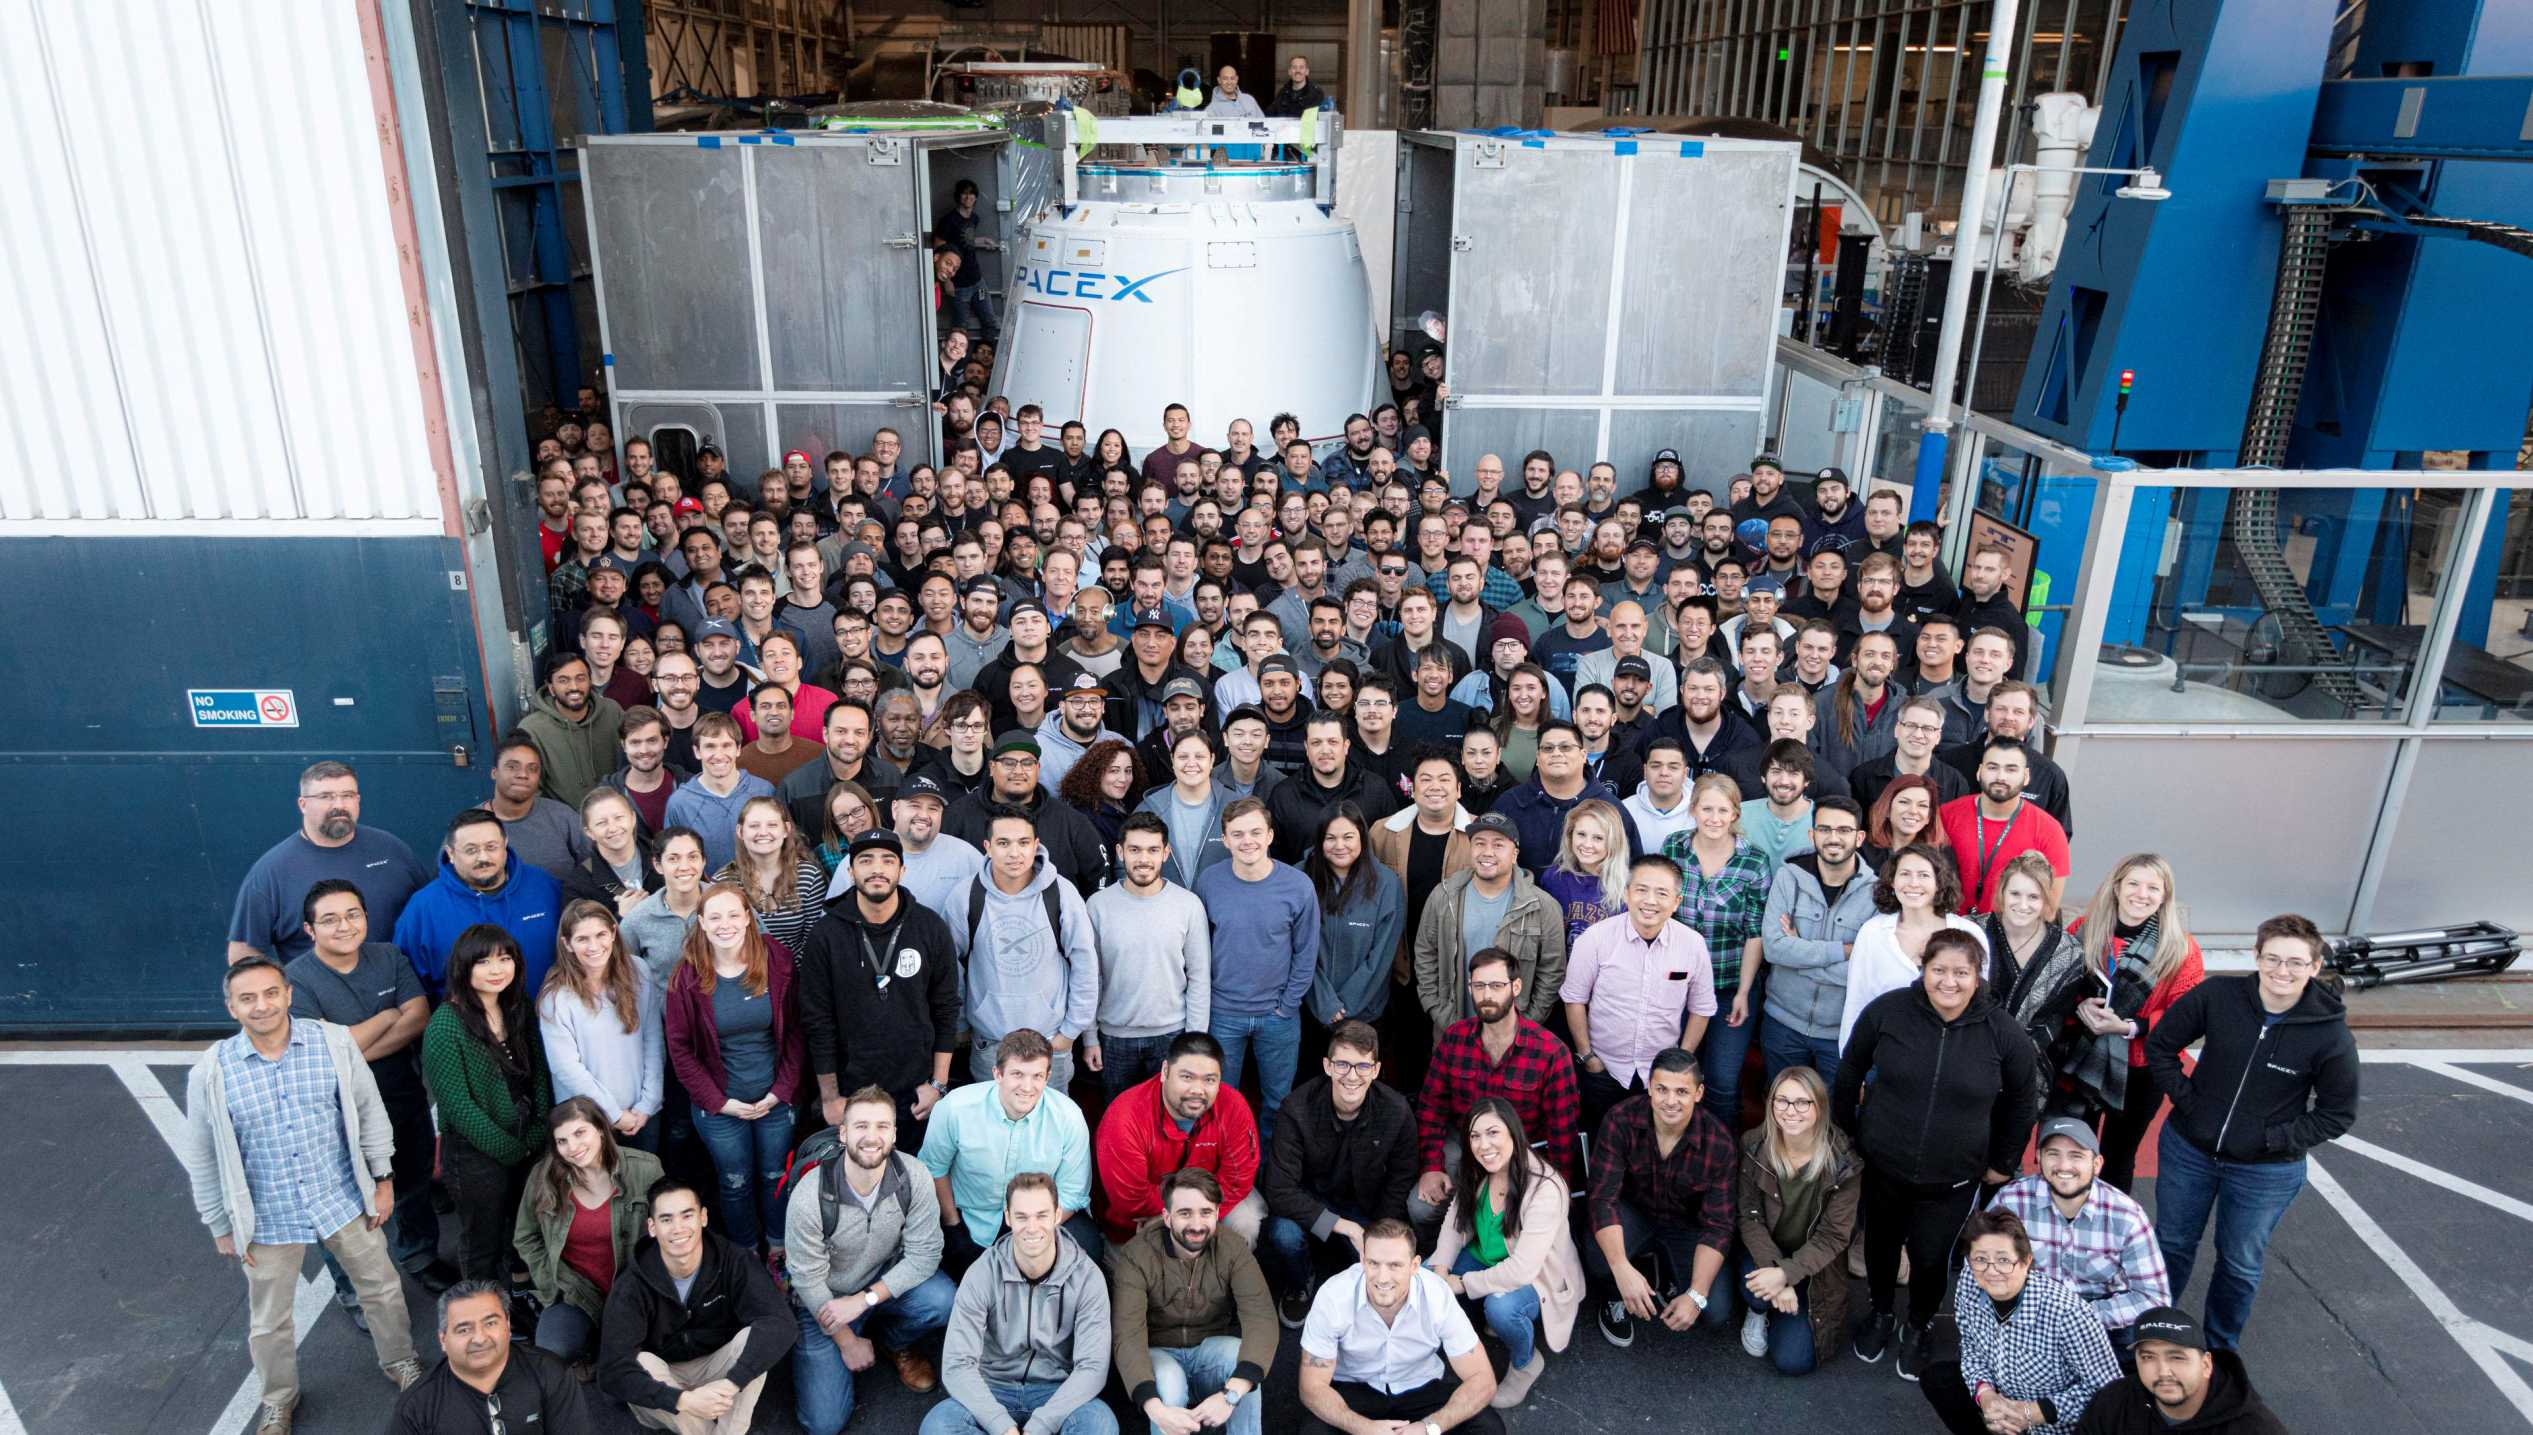 CRS-20 Cargo Dragon Hawthorne production team Feb 2020 (SpaceX) 1 crop (c)